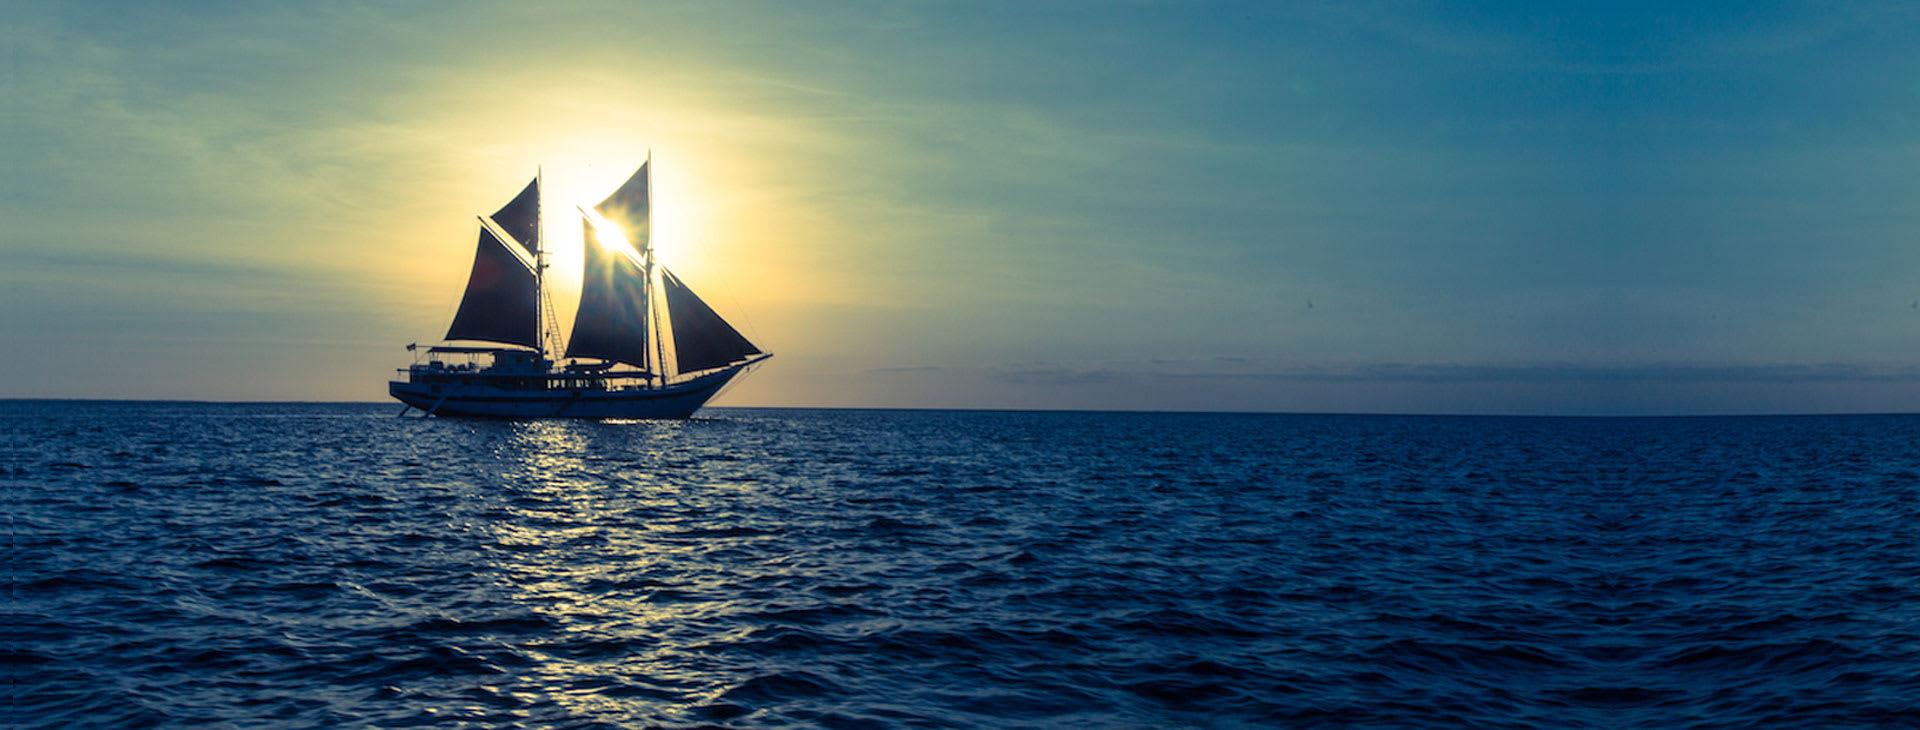 Ombak Putih sailing